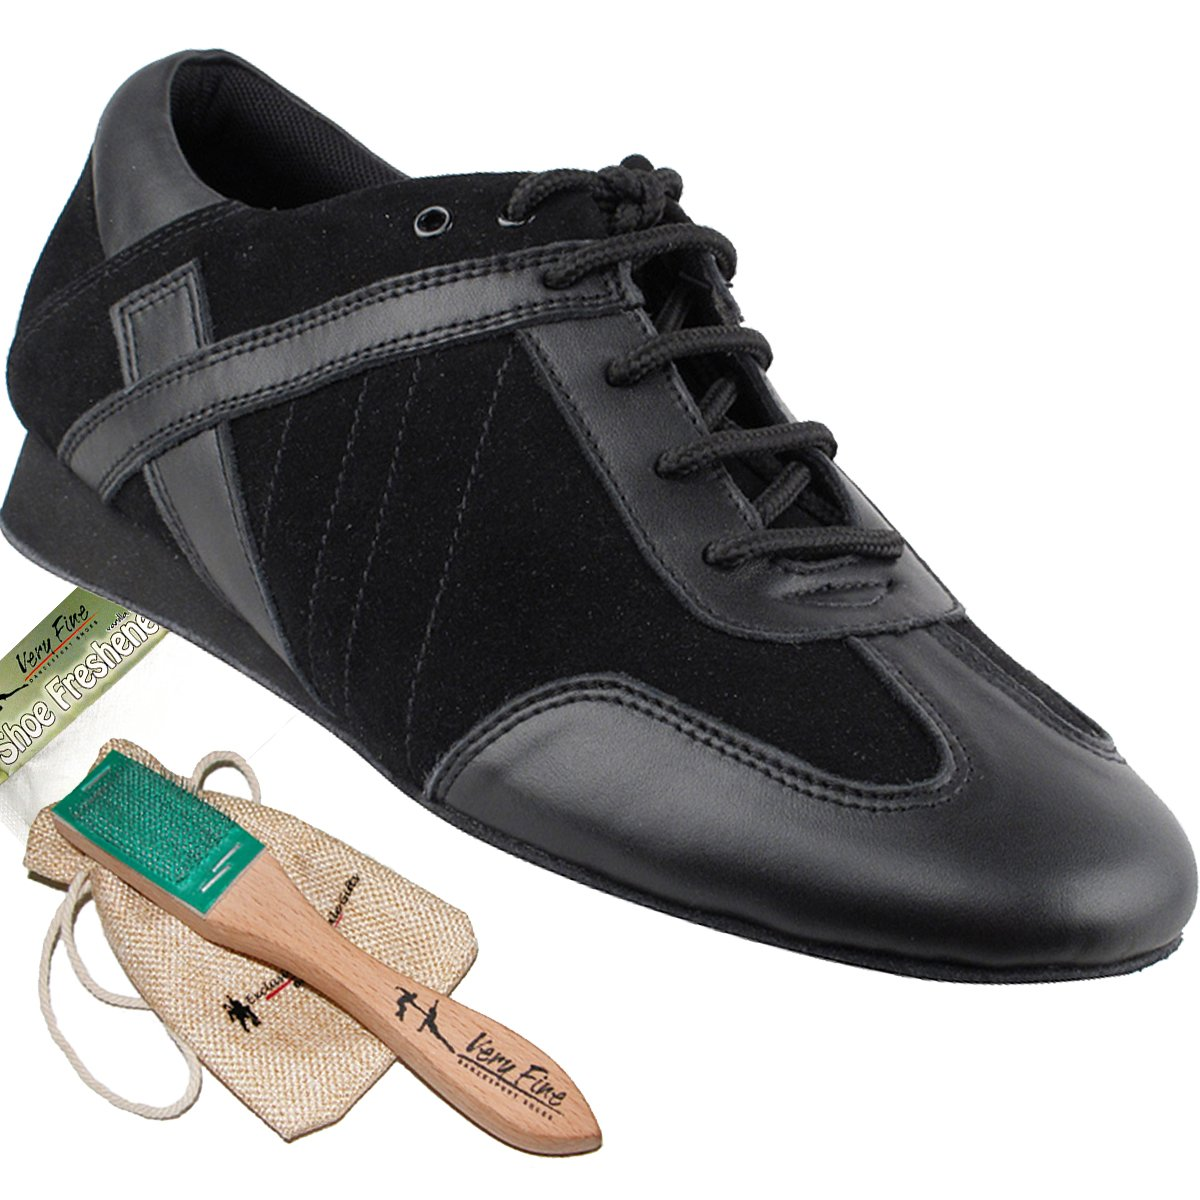 Men's Ballroom Latin Salsa Sneaker Dance Shoes Leather Black SERO106BBXEB Comfortable - Very Fine 8.5 M US [Bundle of 5] by Very Fine Dance Shoes (Image #1)